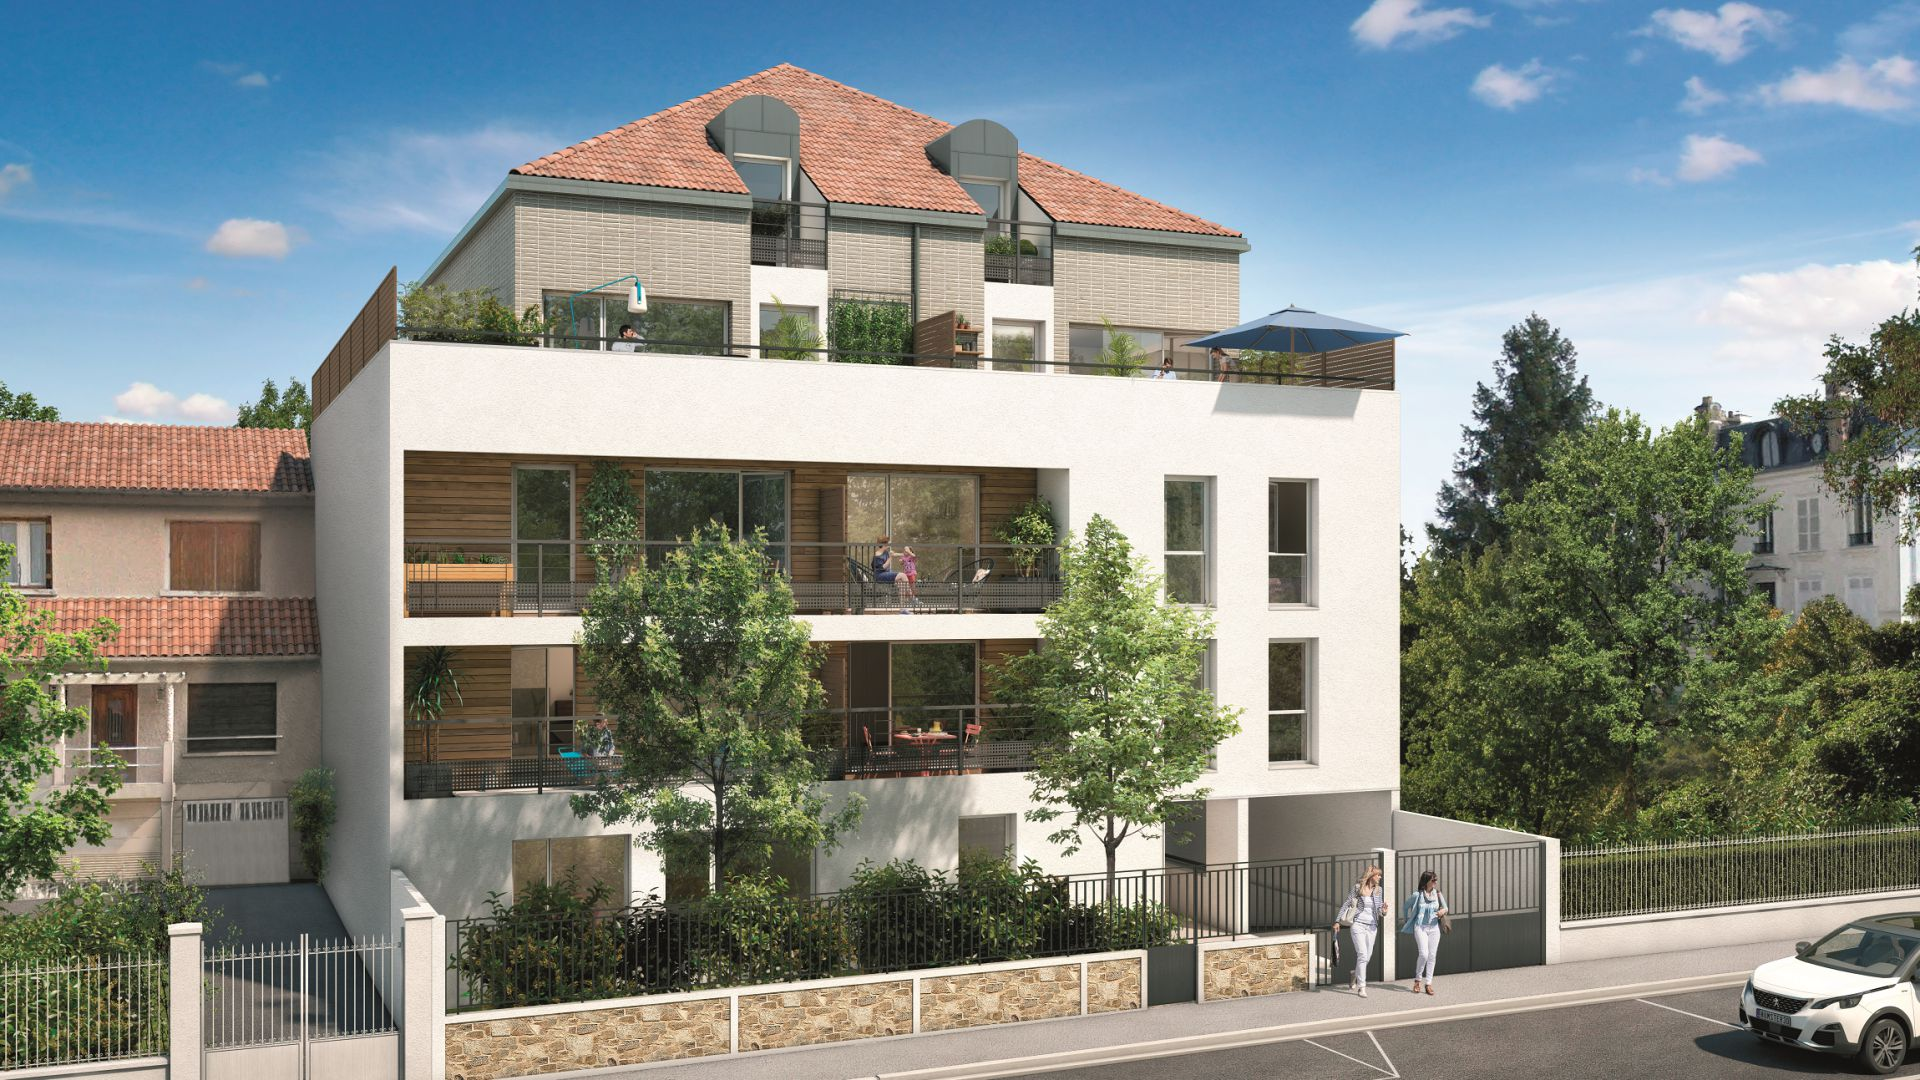 GreenCity immobilier - Livry-Gargan - 93190 - appartements du T1Bis au T3 Duplex